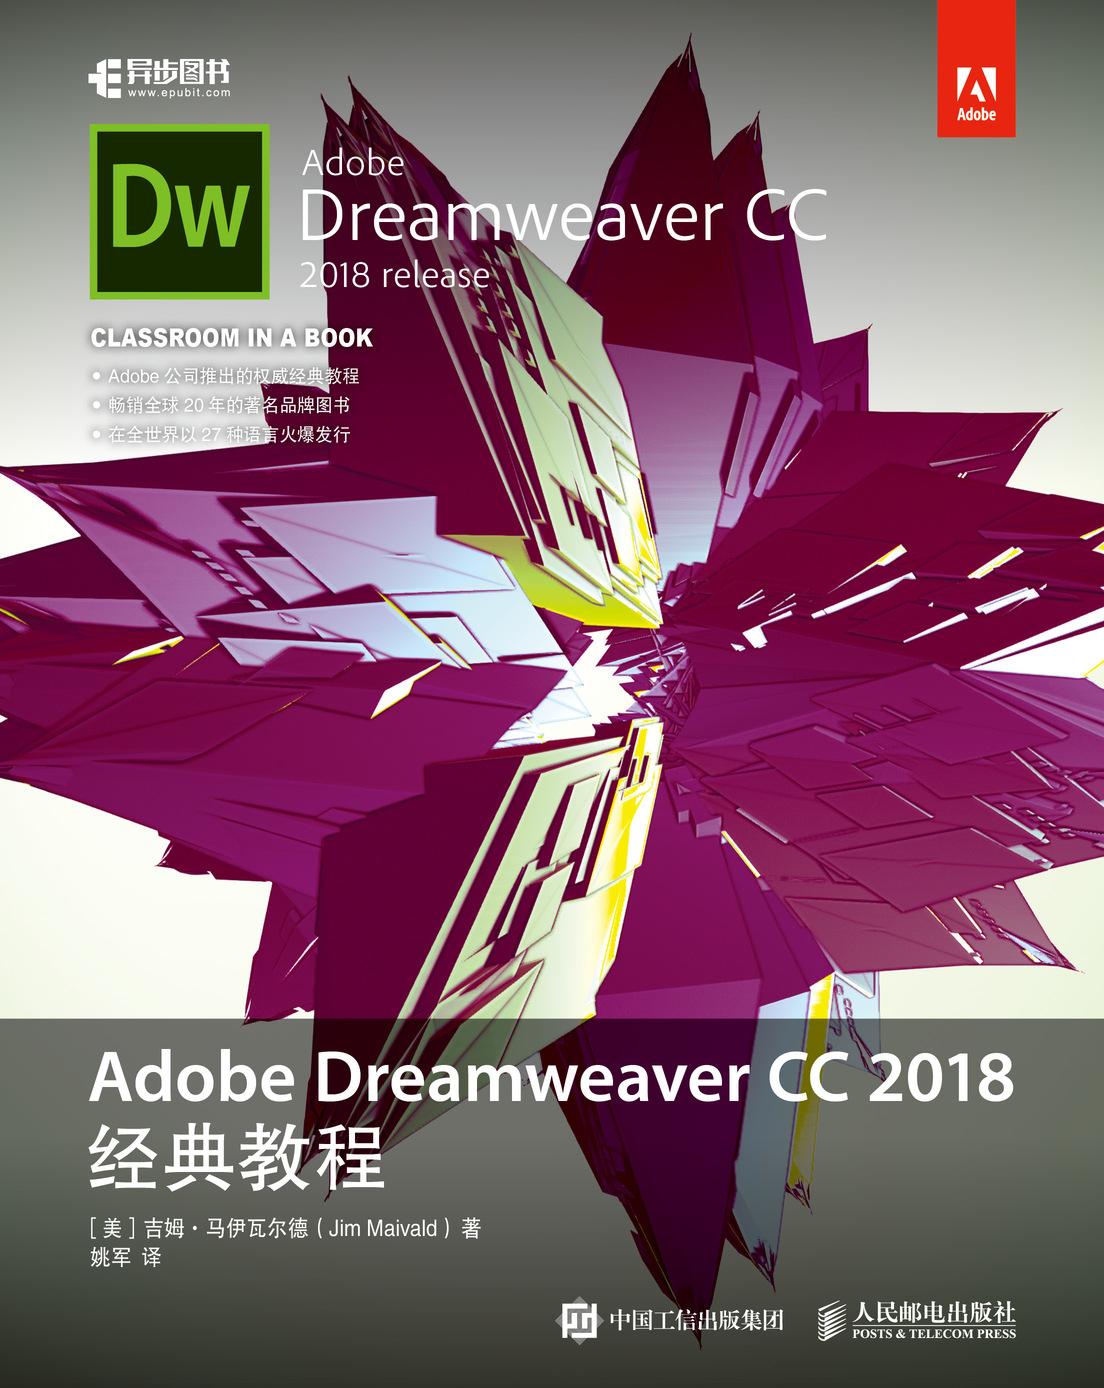 Adobe Dreamweaver CC 2018经典教程 PDF格式高清电子书免费下载